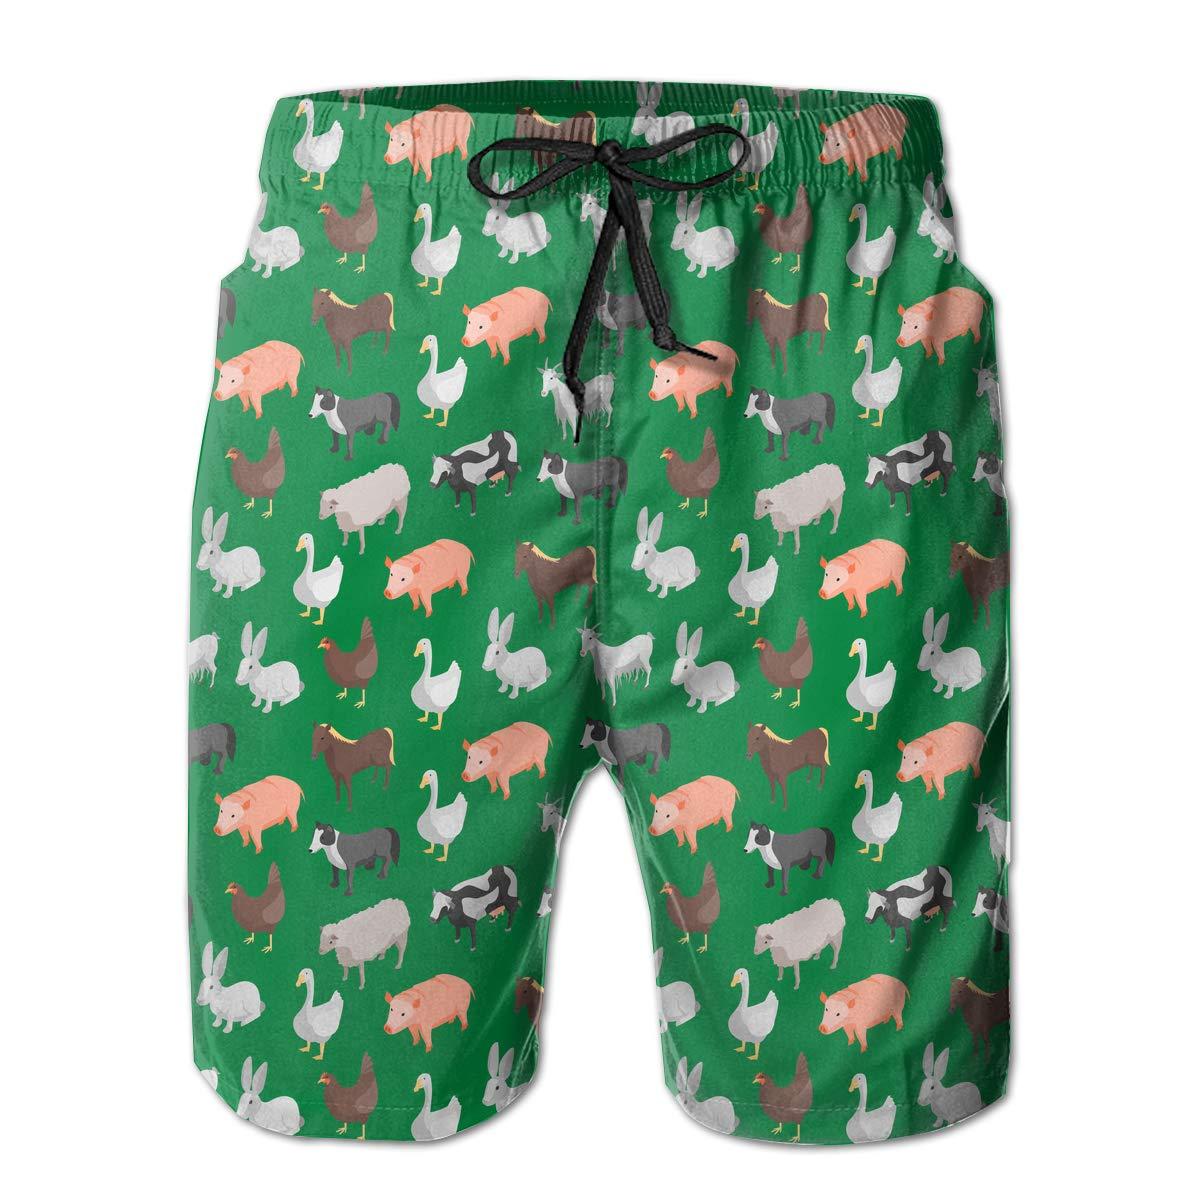 Farm Animals Mens Beach Shorts Casual Athletic Shorts with 3 Pockets